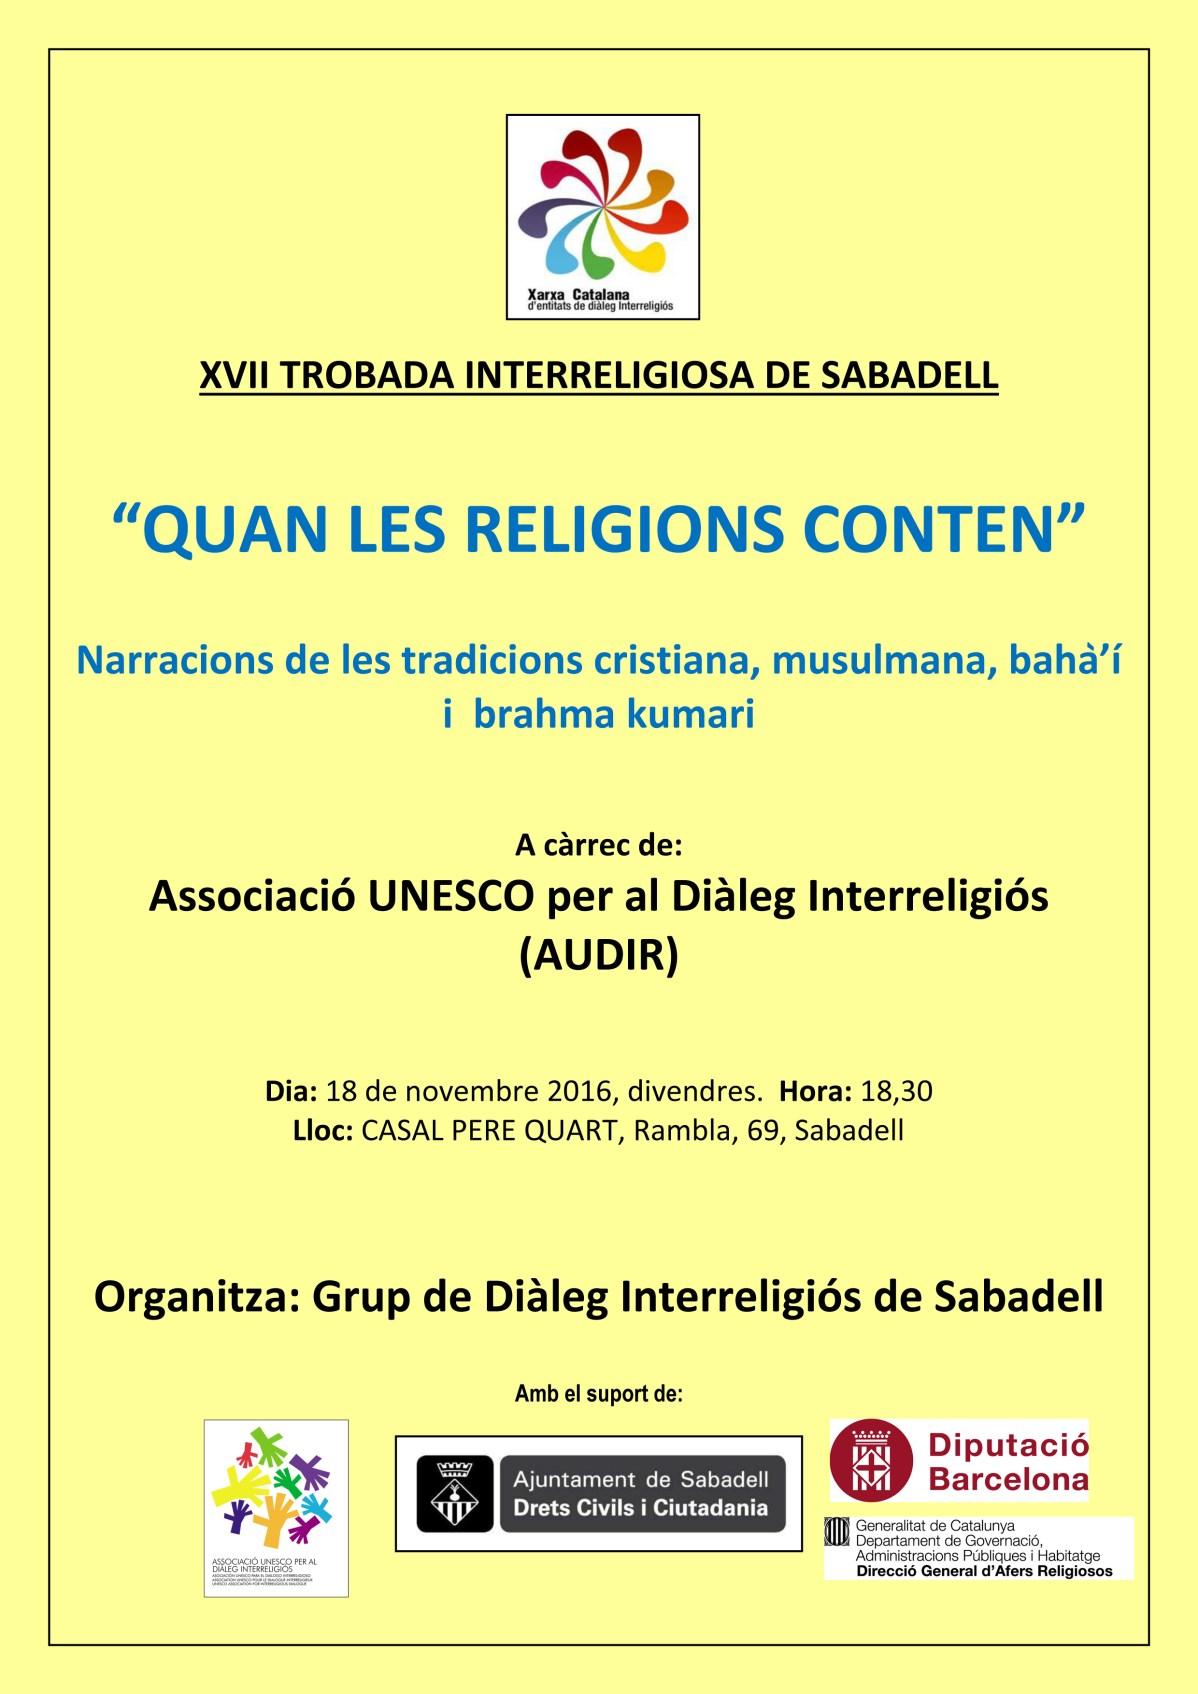 XII TROBADA INTERRELIGIOSA Sabadell 2012